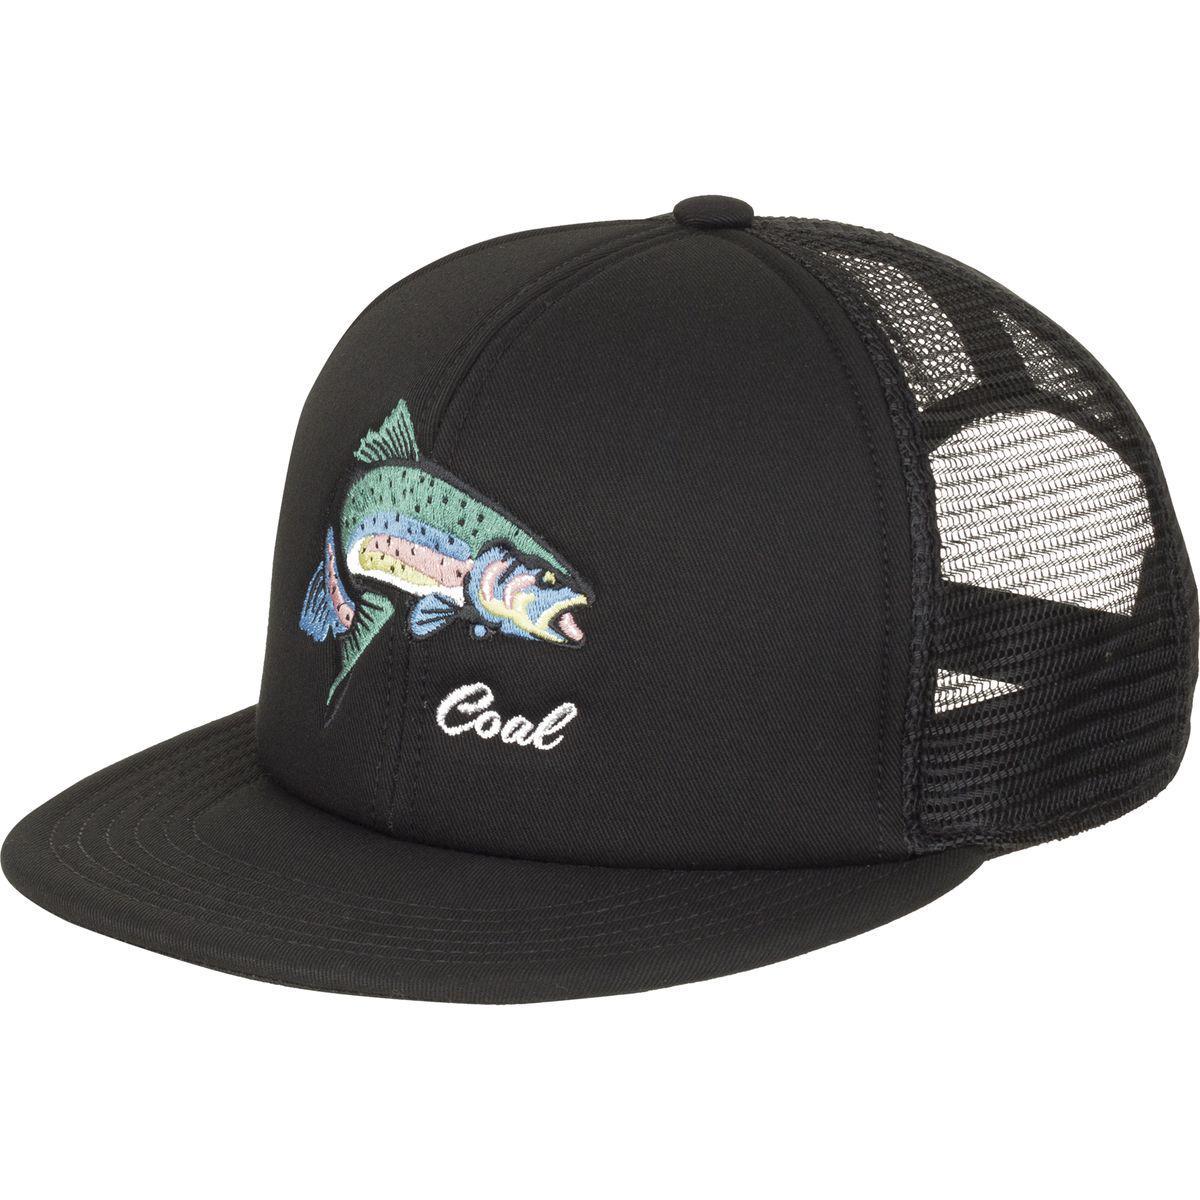 00c8e06b19c Lyst - Coal Wilds Trucker Hat in Black for Men